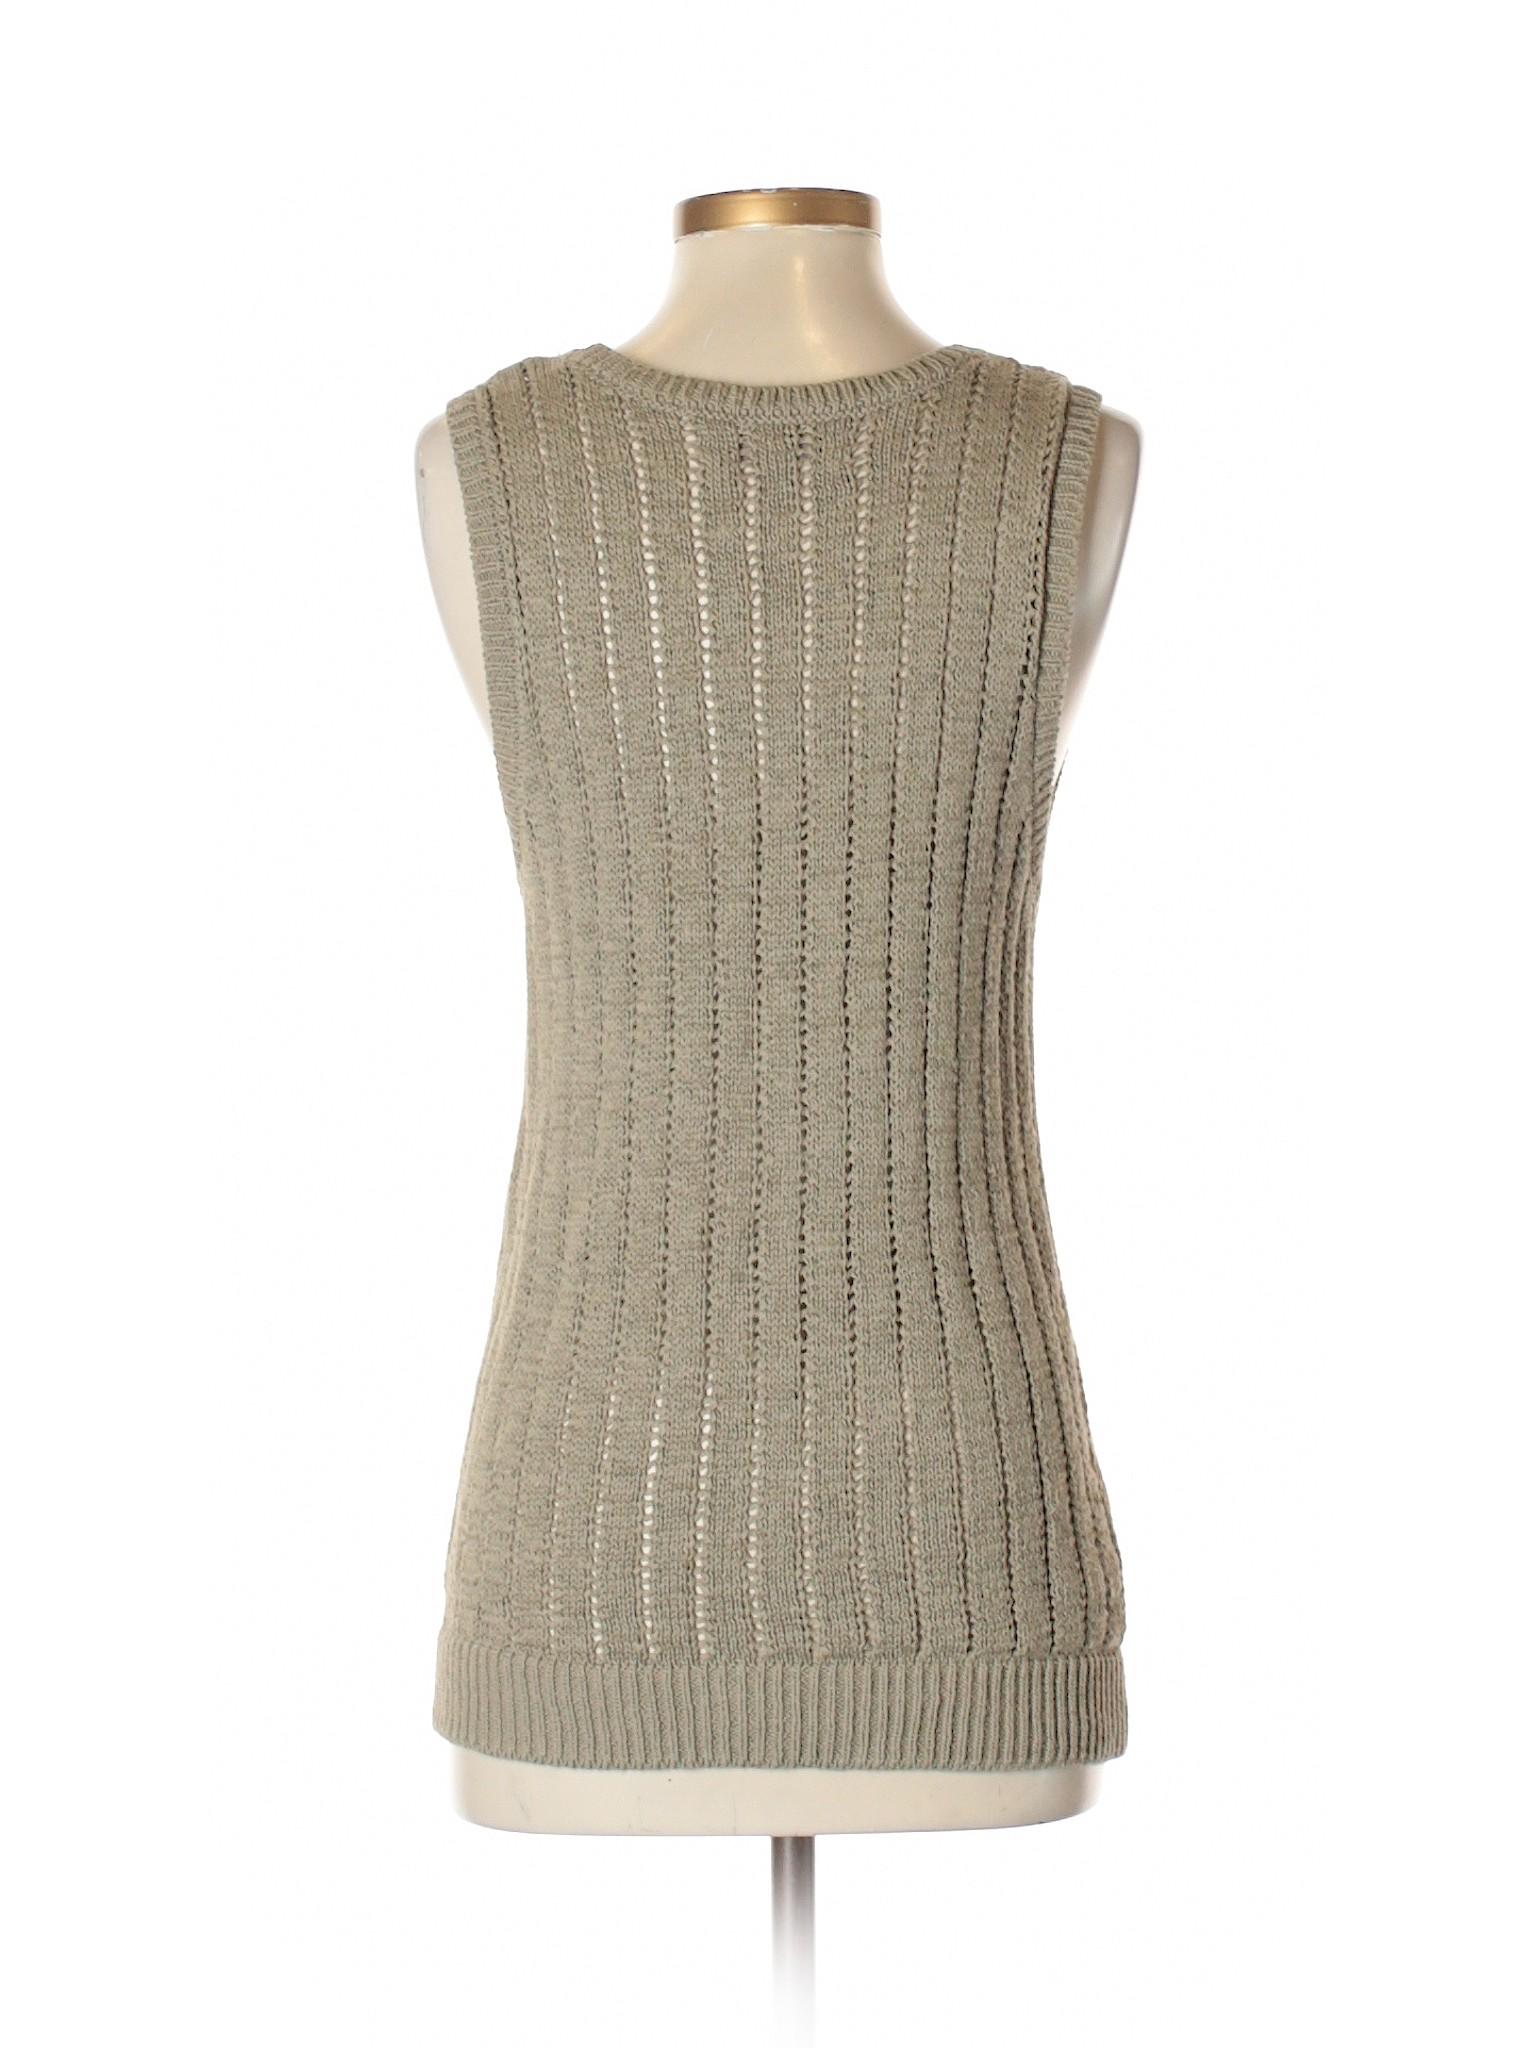 LOFT Sweater Boutique Taylor Ann Pullover wnR4wxY0q